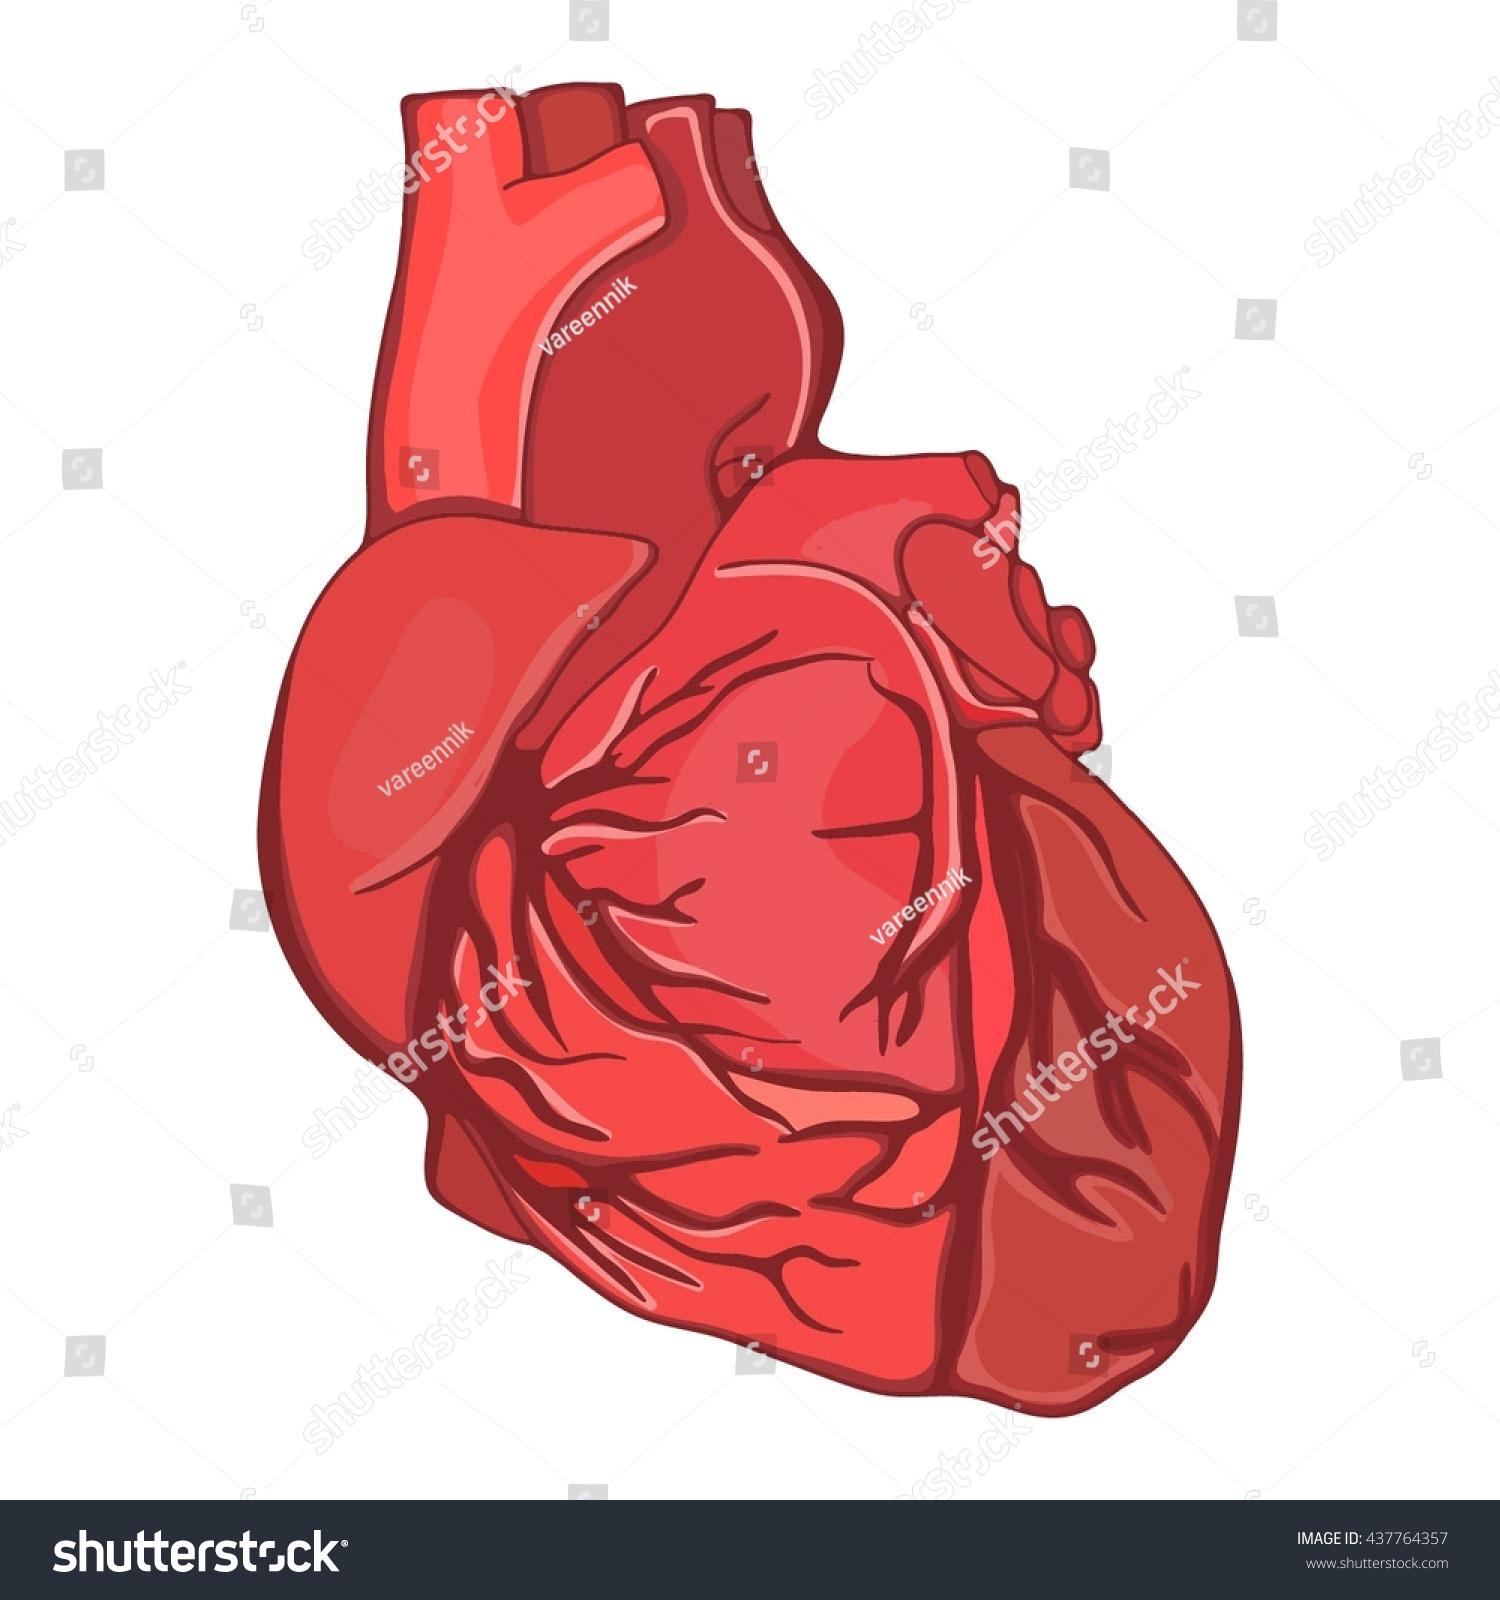 Vector Heart Human Organ Human Anatomy Stock Vector Royalty Free